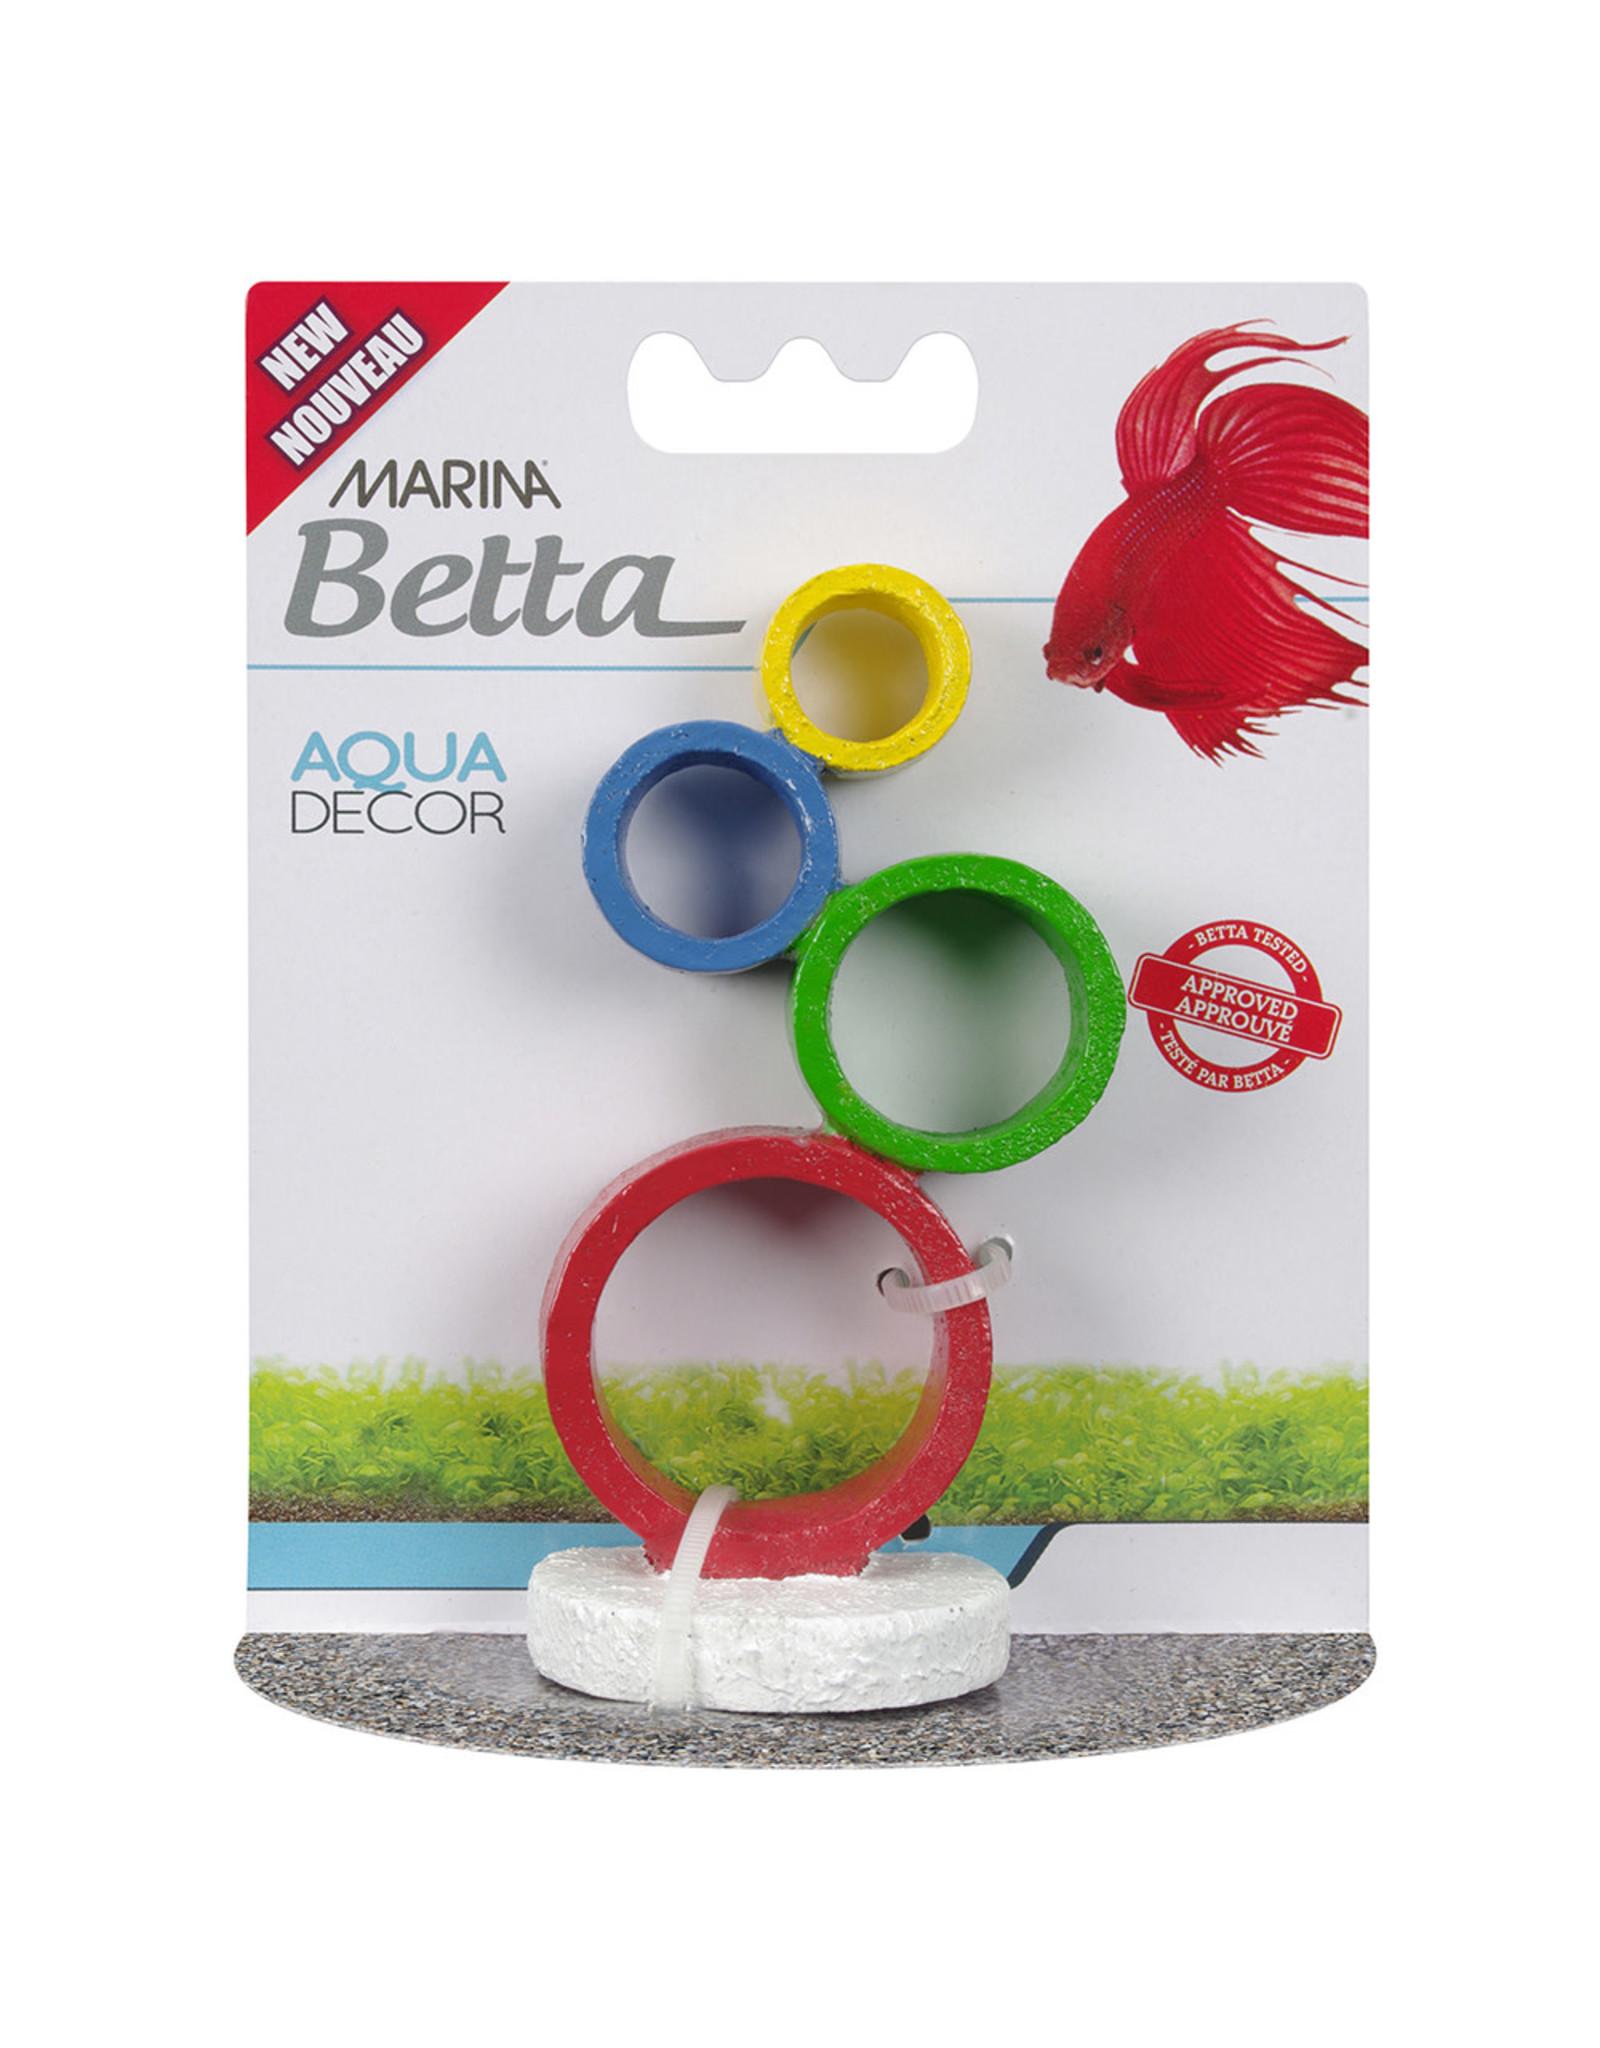 Marina Marina Betta Aqua Decor Ornament - Circus Rings